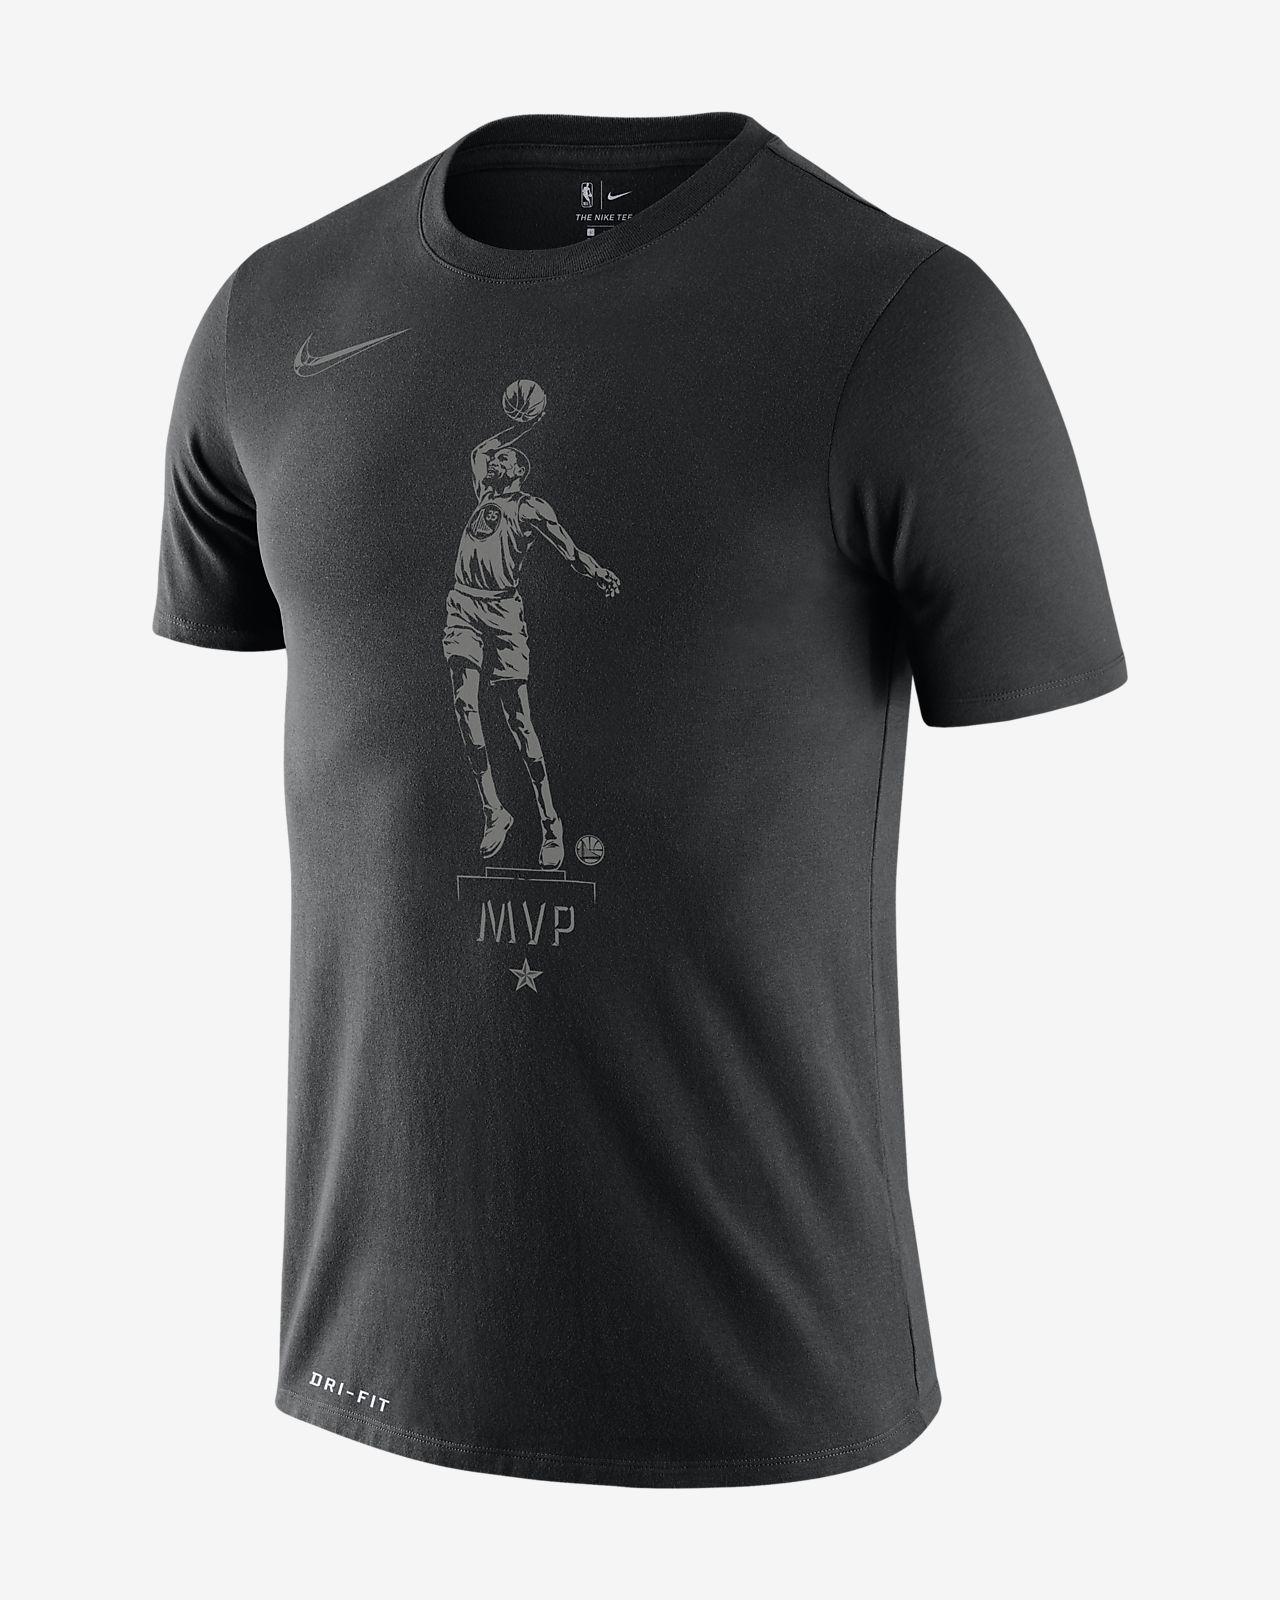 407edf023c02 Kevin Durant Nike Dri-FIT